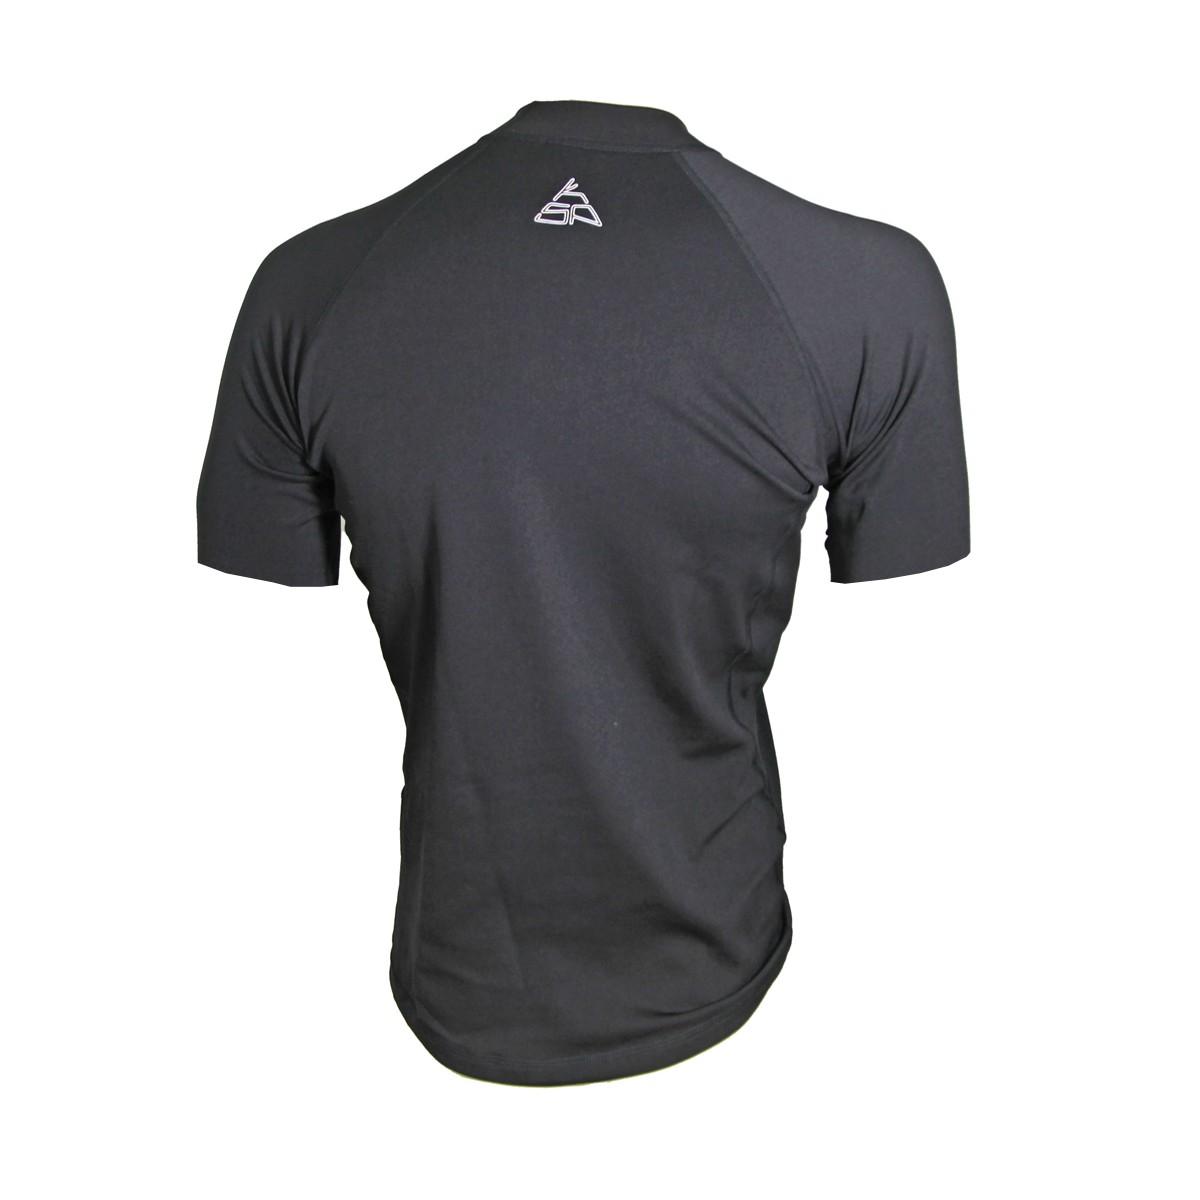 t-shirt lycra kitesurf